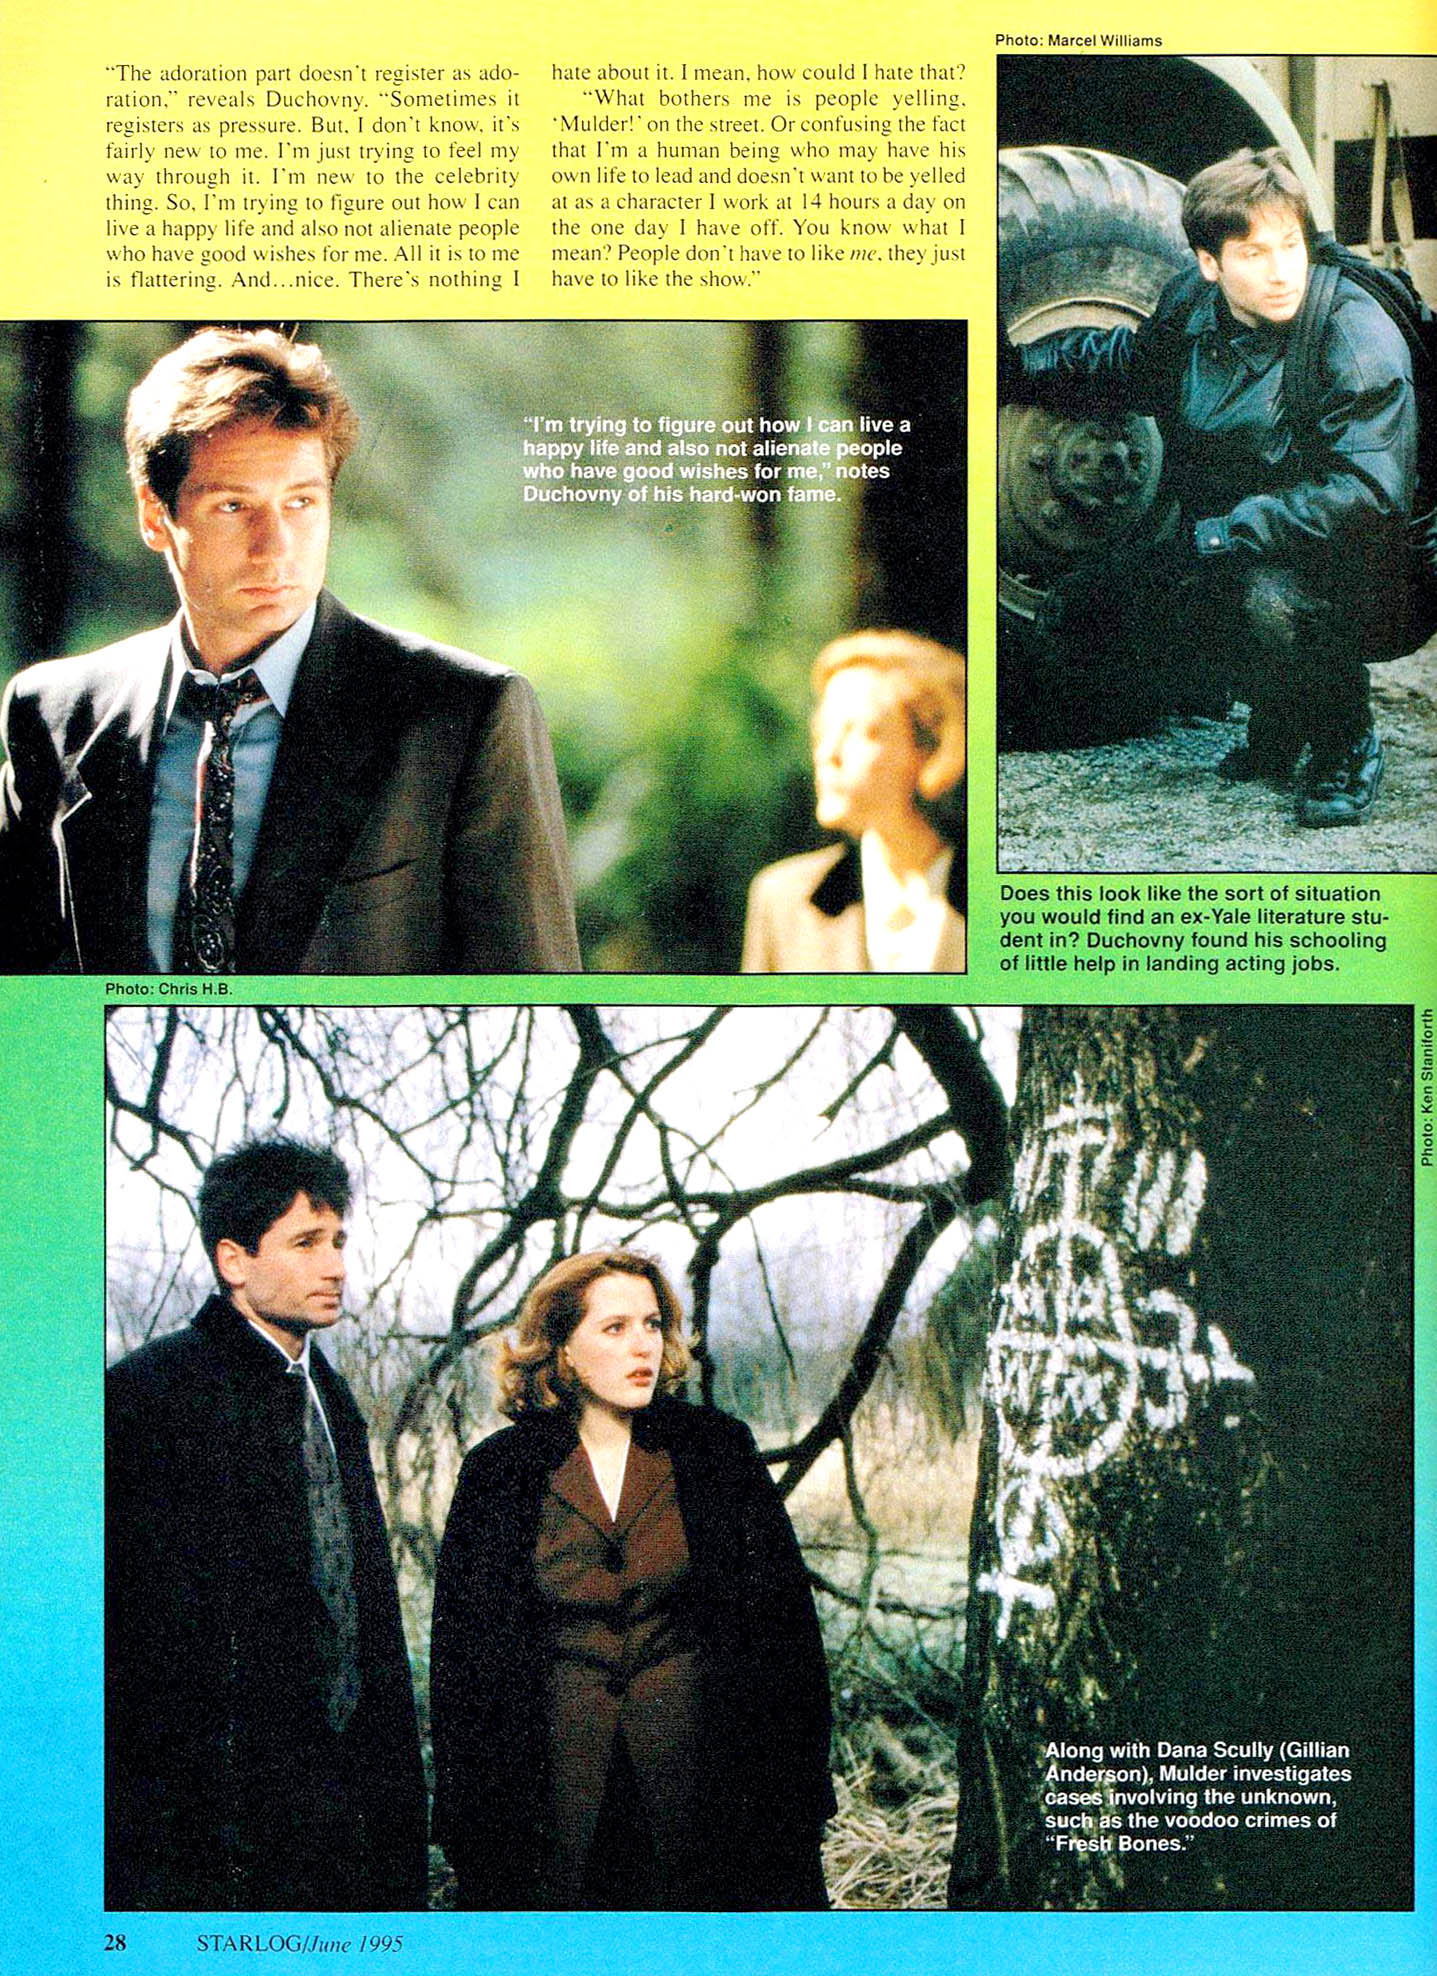 Starlog 215 1995 06 X-Files-2.jpg